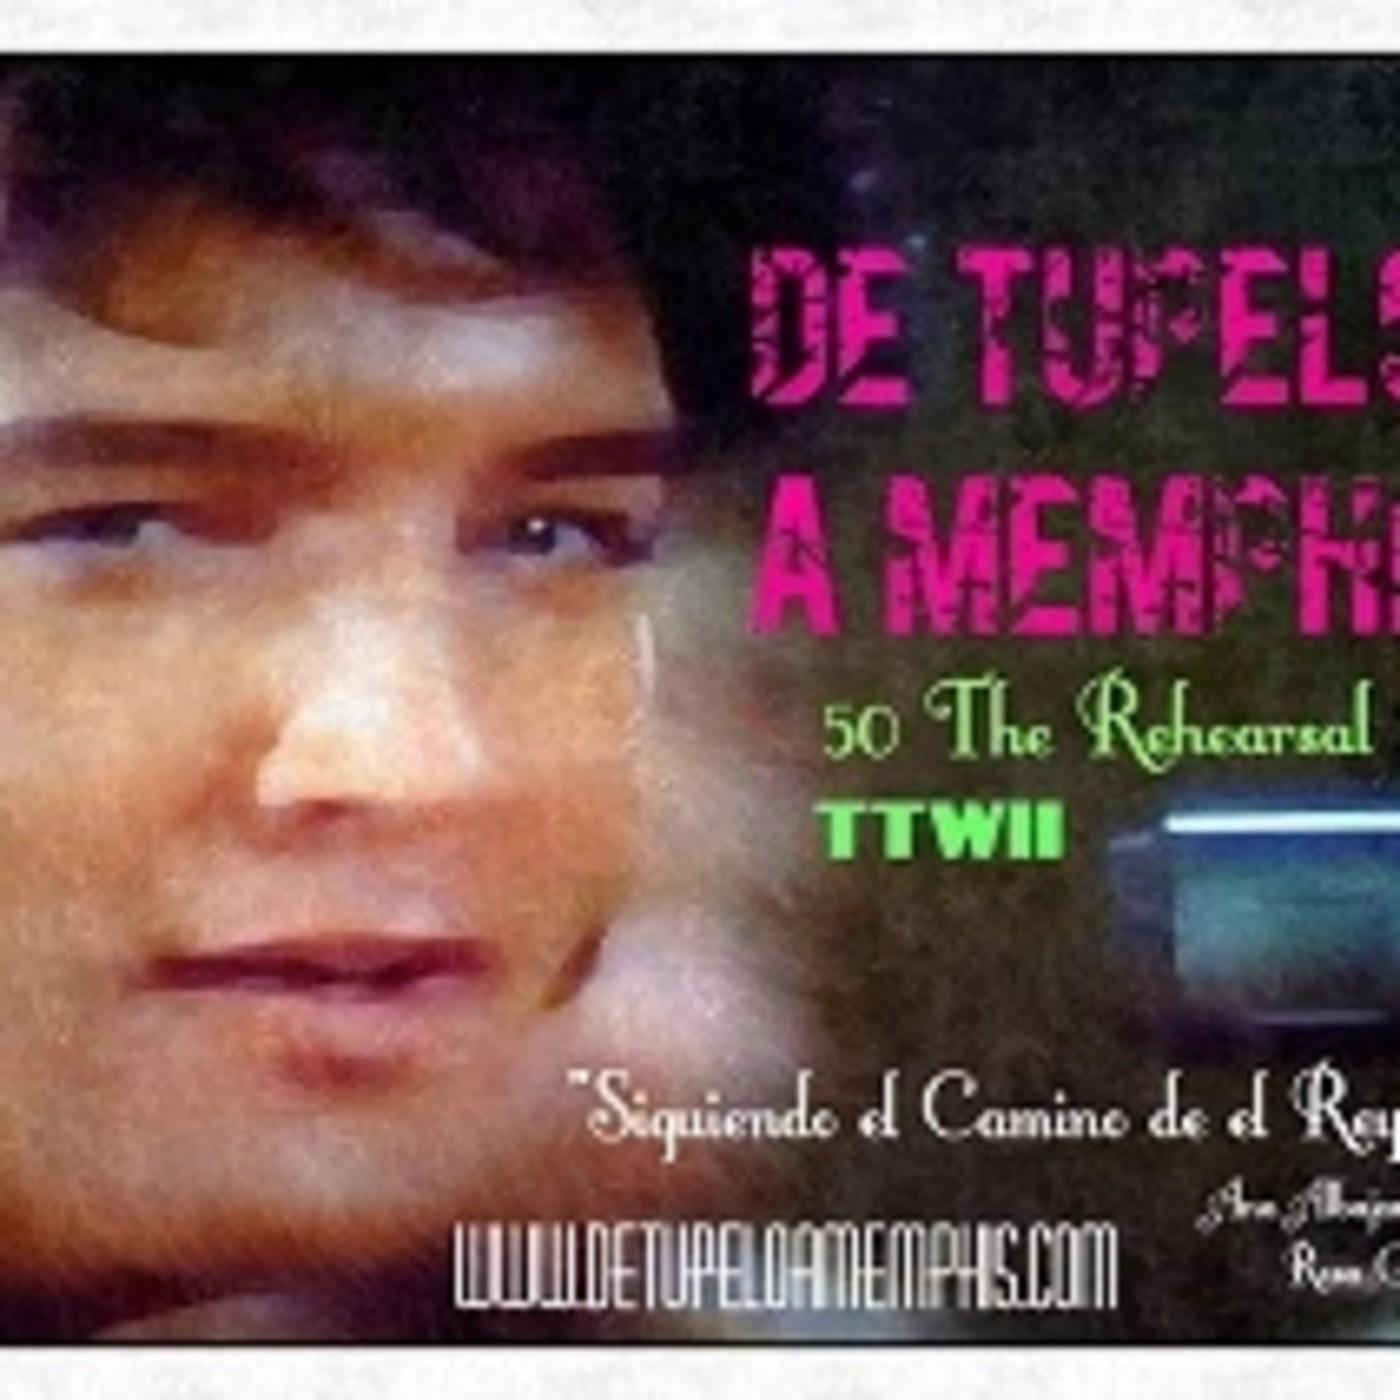 DE TUPELO A MEMPHIS 50 The Rehearsal 2 TTWII